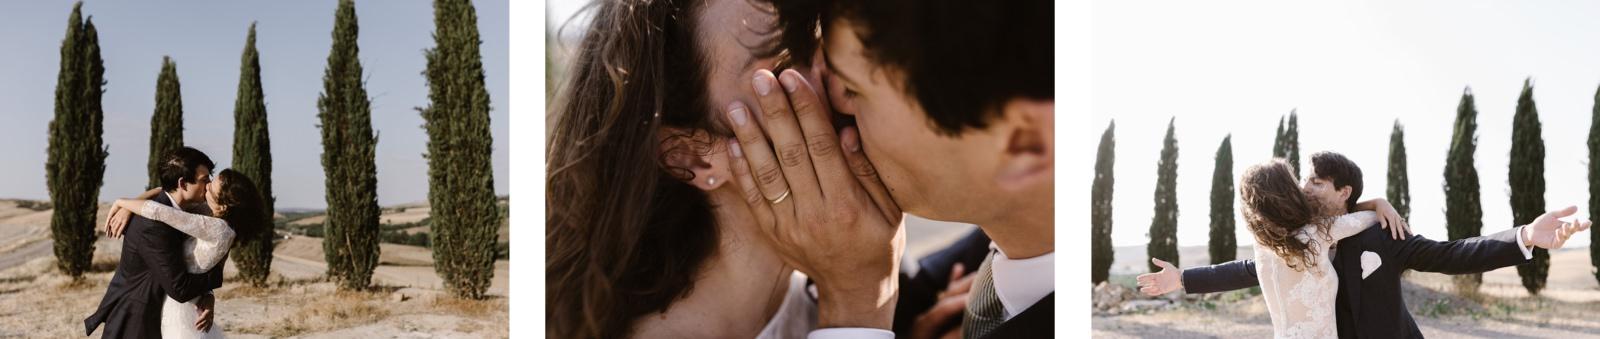 Fotomagoria Tuscany Wedding Photographer 9.jpg